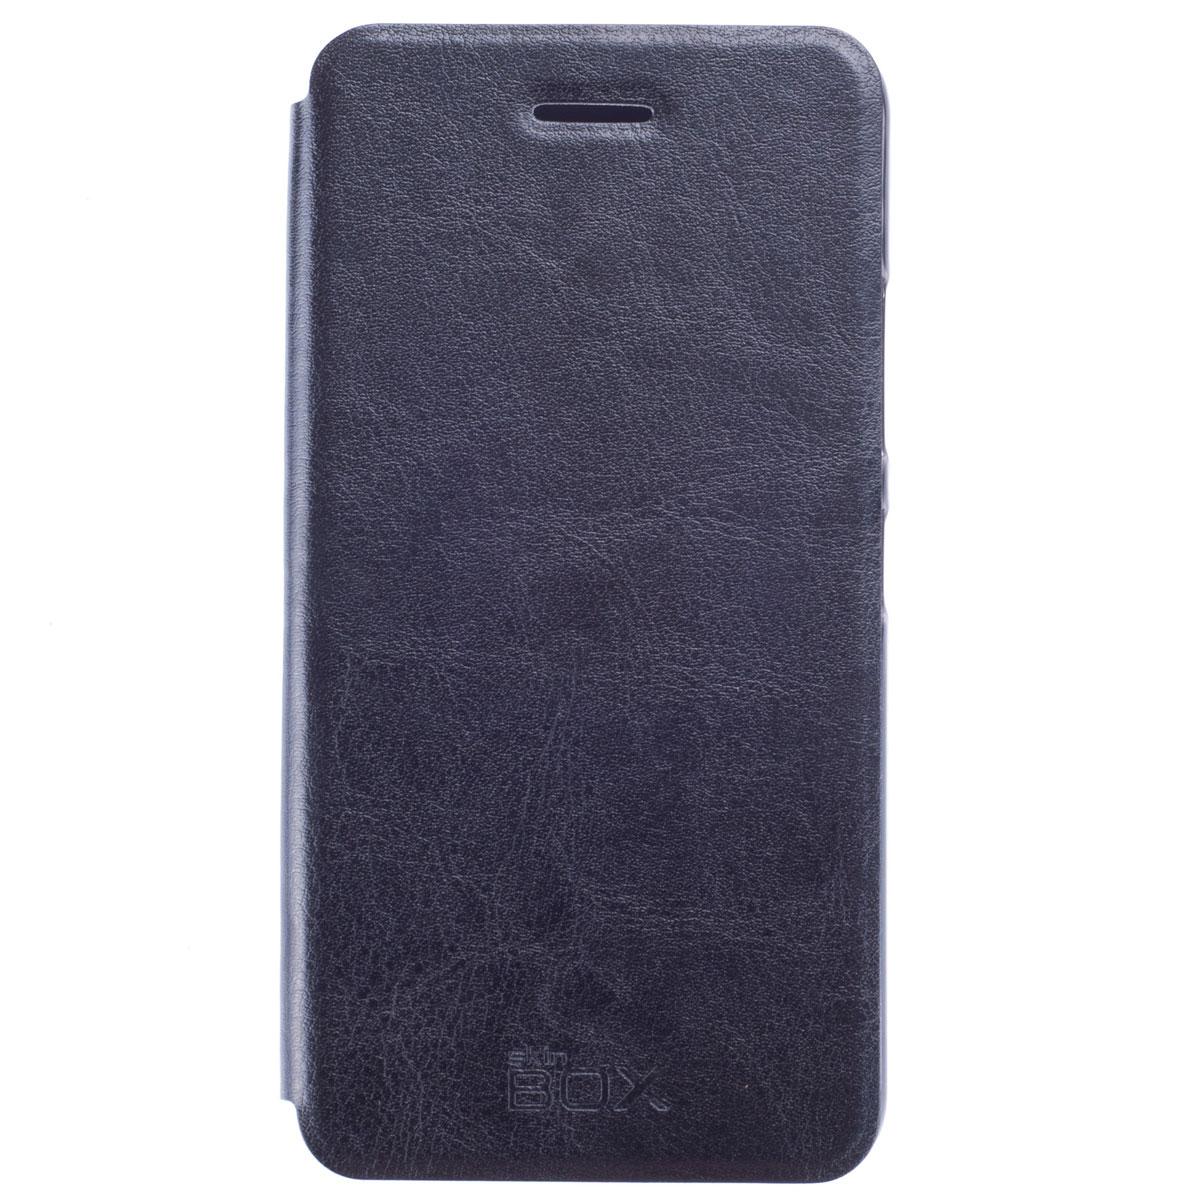 Skinbox Lux чехол для Lenovo S60, Black skinbox lux чехол для lenovo vibe s1 black